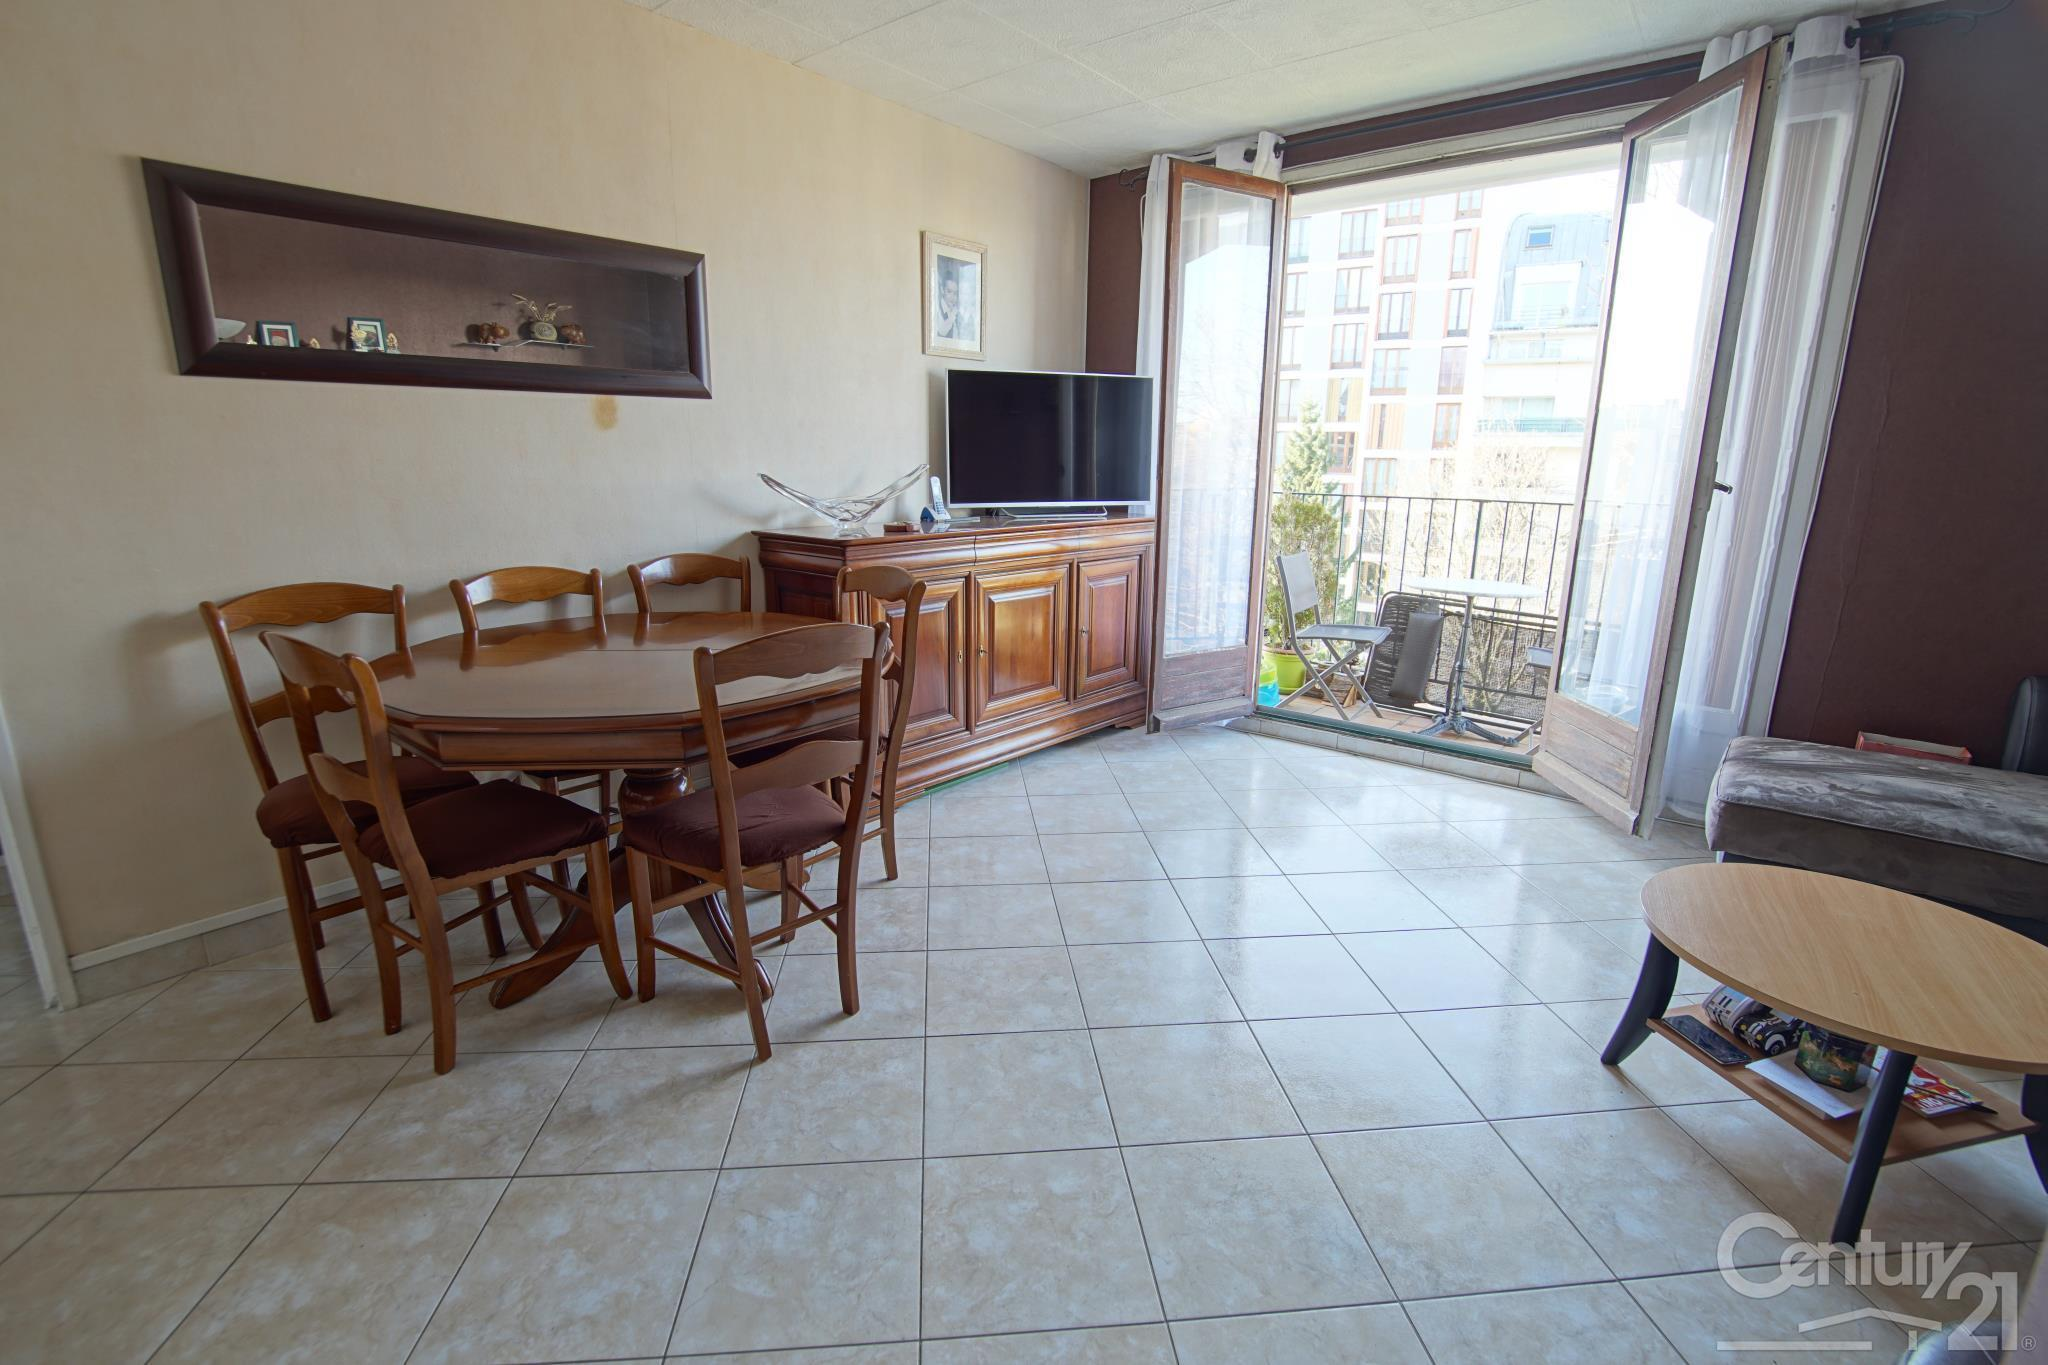 Annonce vente appartement choisy le roi 94600 53 m for Annonce vente appartement